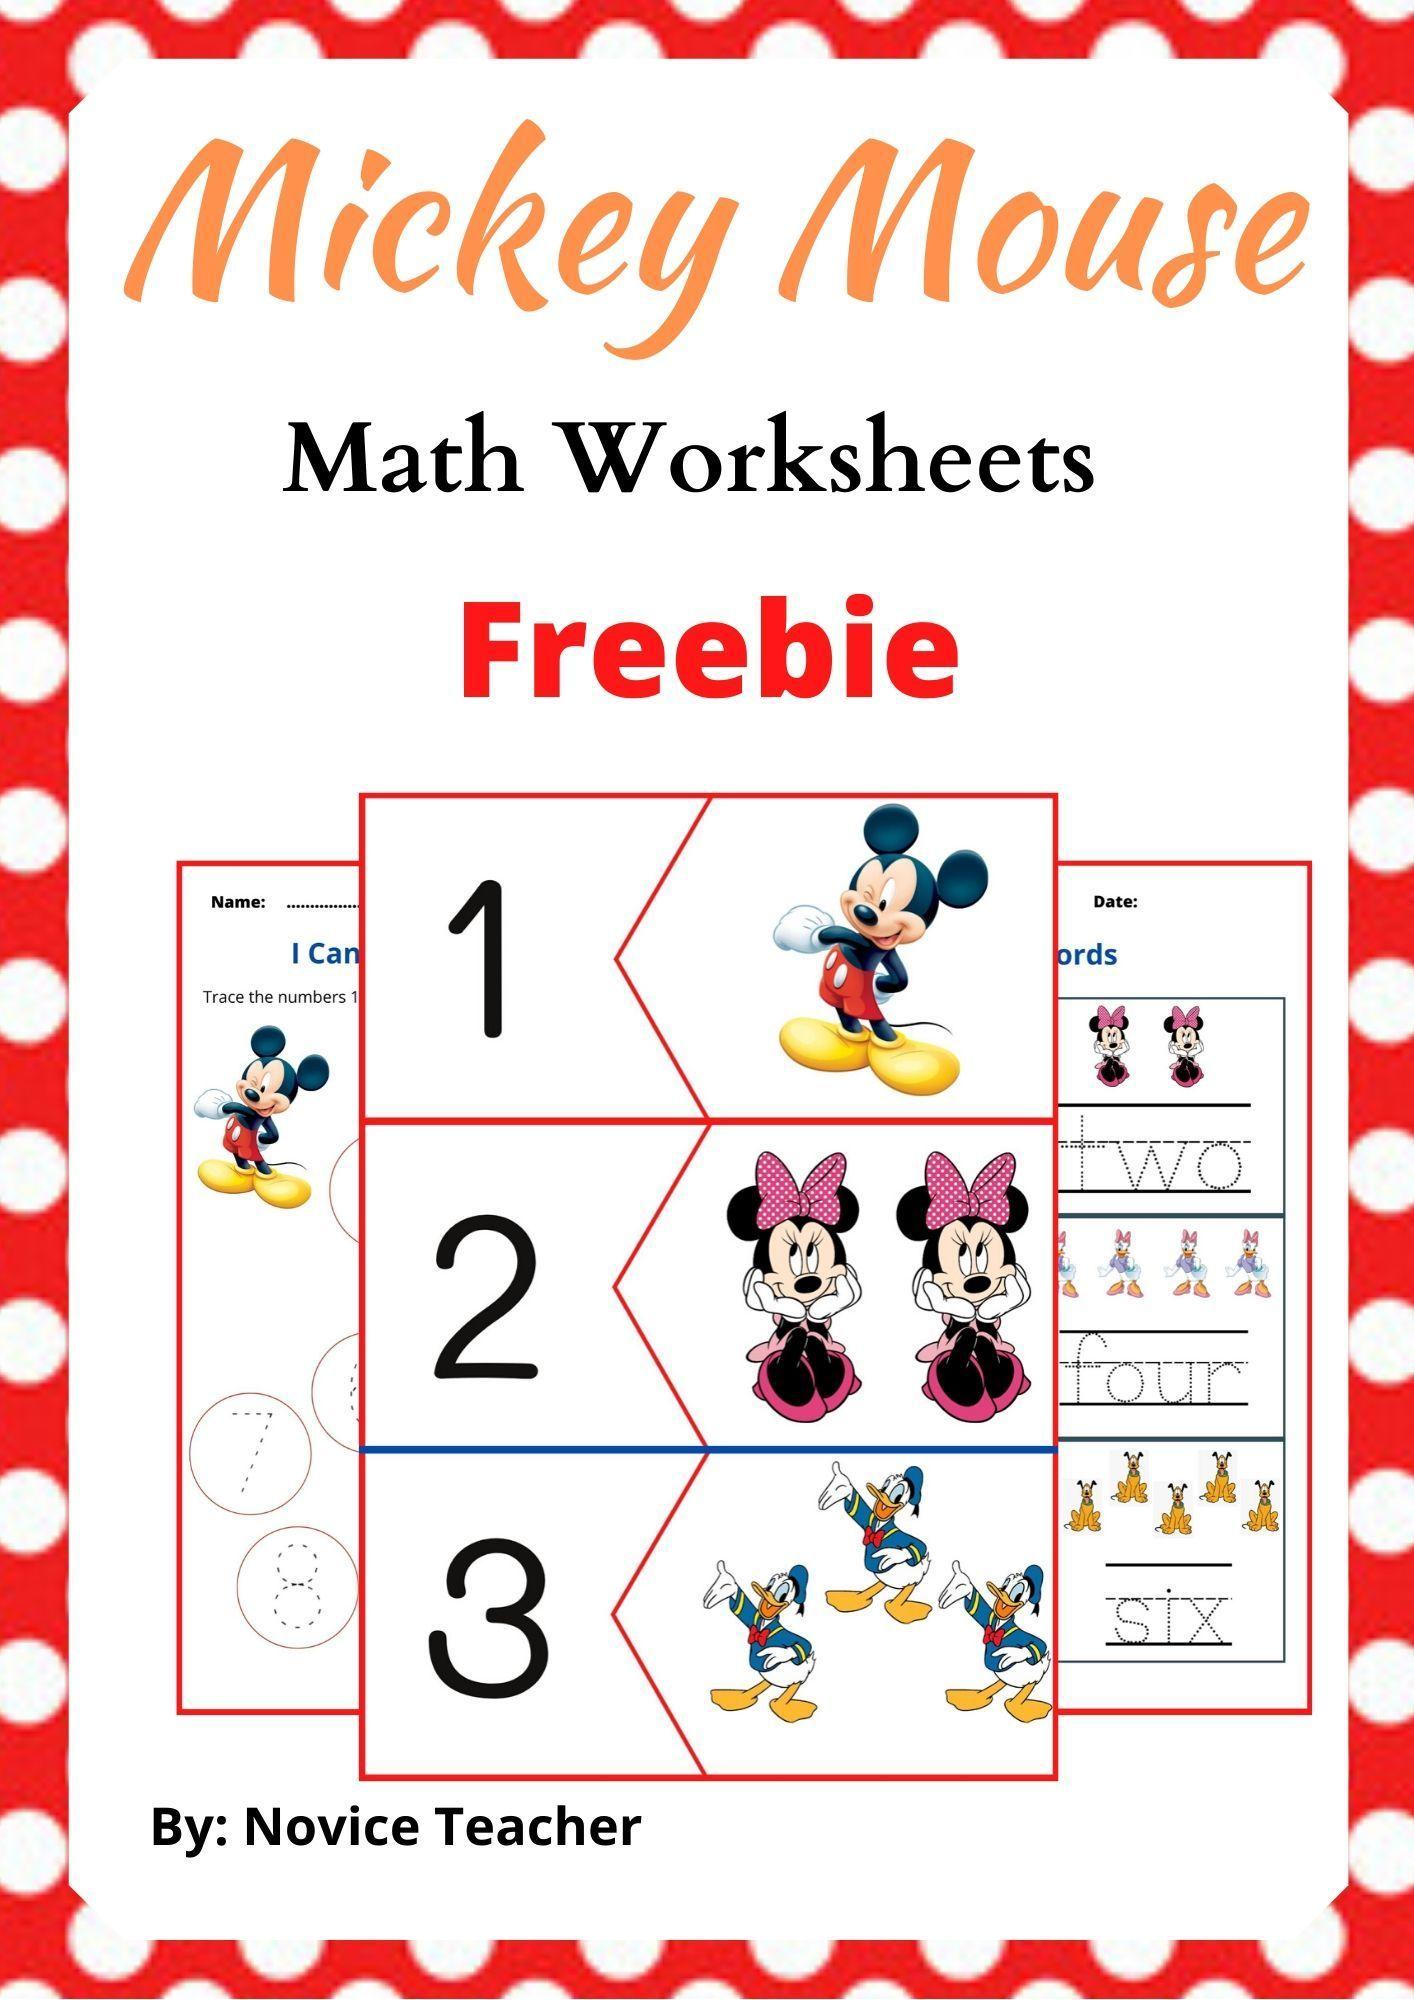 Mickey Mouse Math Worksheets Freebie Math Worksheets Free Math Activity Mickey Mouse [ 2000 x 1414 Pixel ]